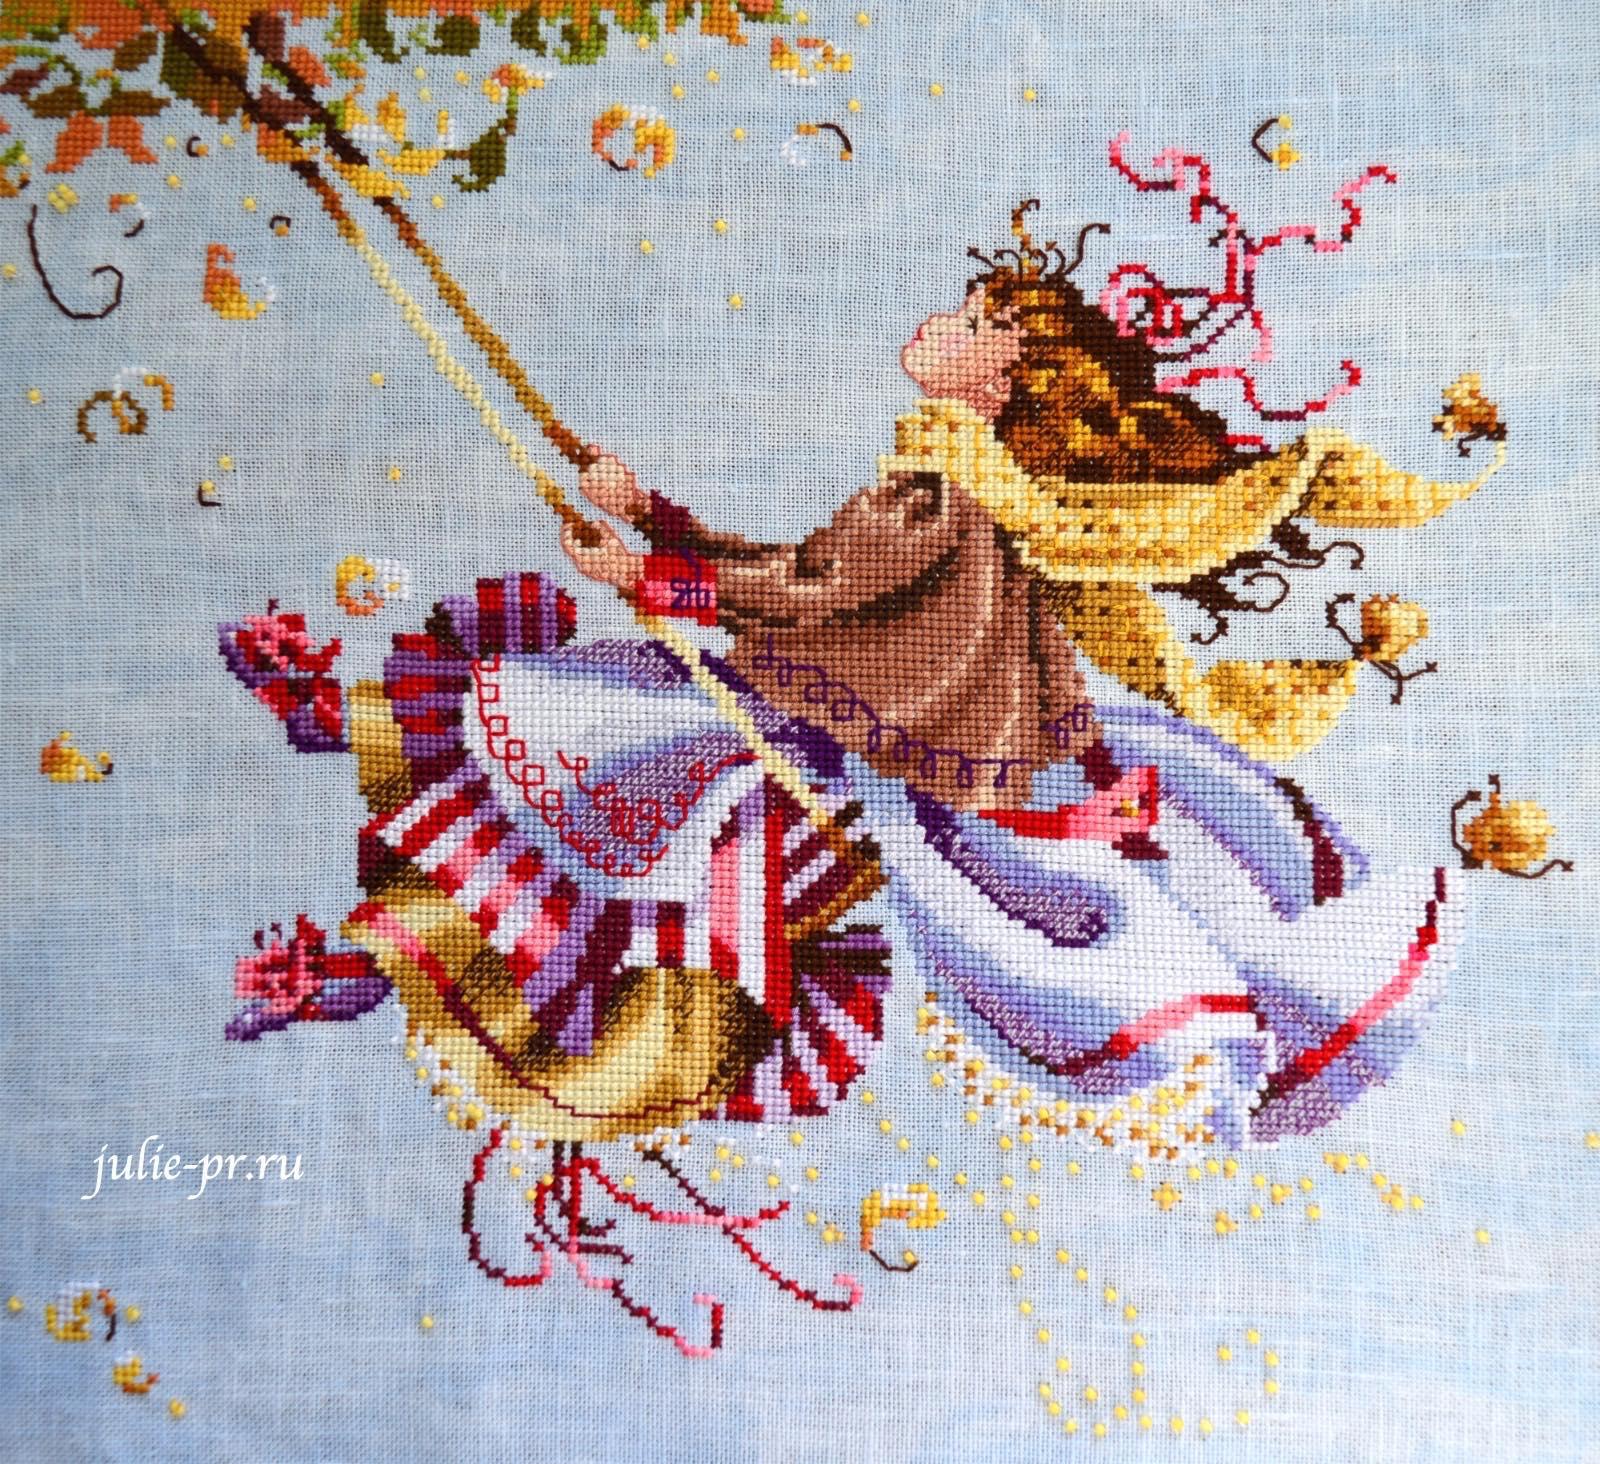 Вышивка крестом, Nora Corbette, Mirabilia MD 33, Touching the Autumn Sky, Касаясь осеннего неба, мирабилия, девочка на качелях